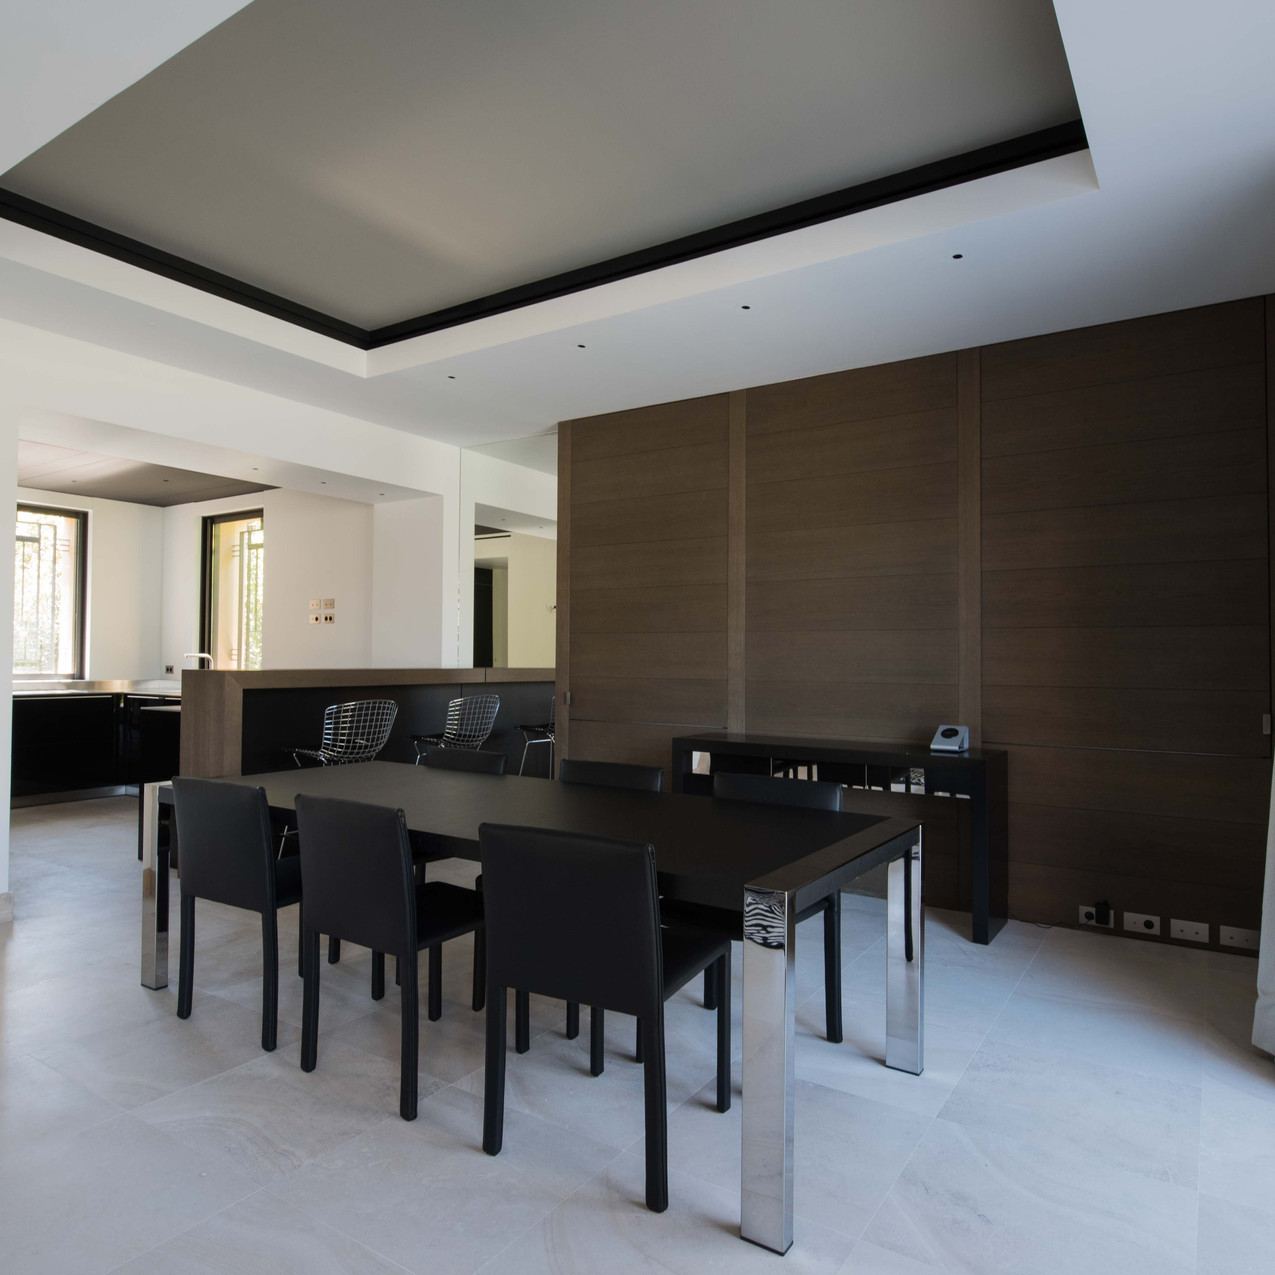 photographe architecture nice france french riviera paca cote dazur interieur-75